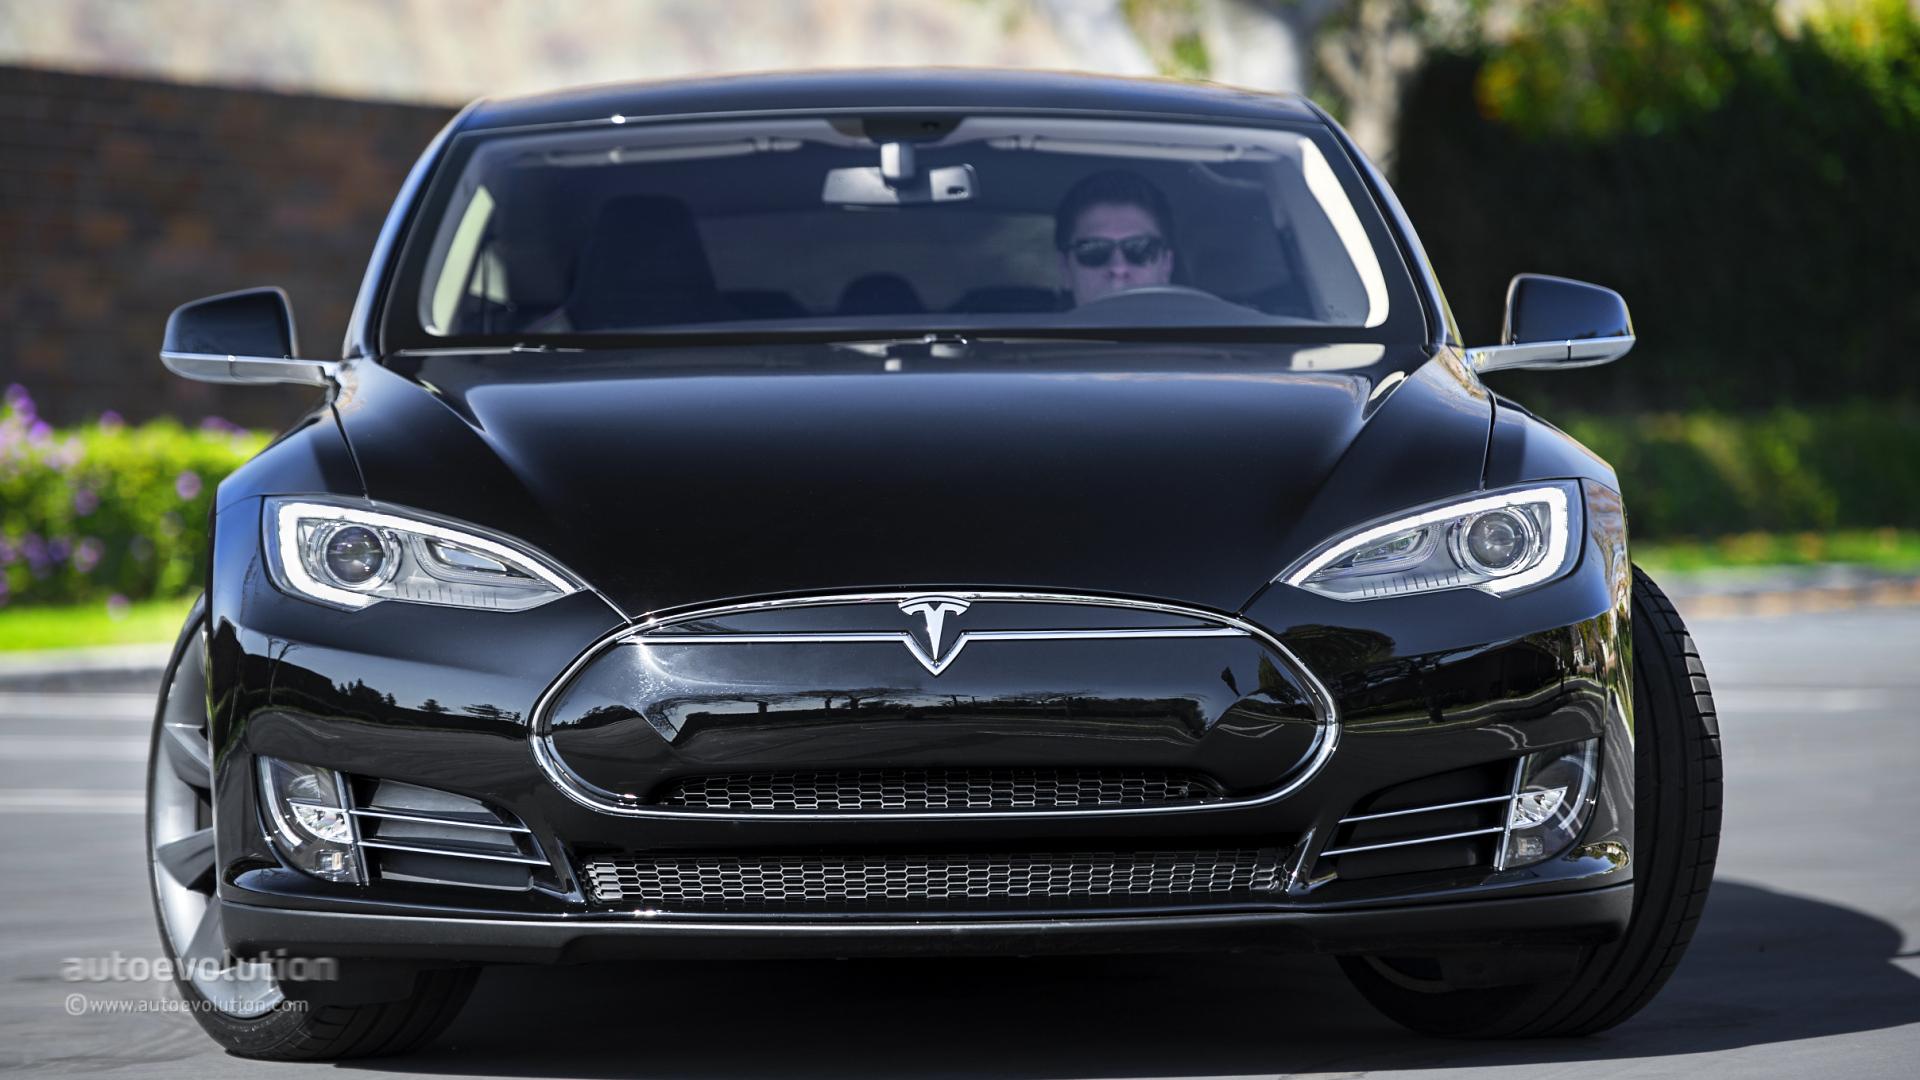 Tesla Model S Updated With Speed Limit Warning & Lane Drift ...